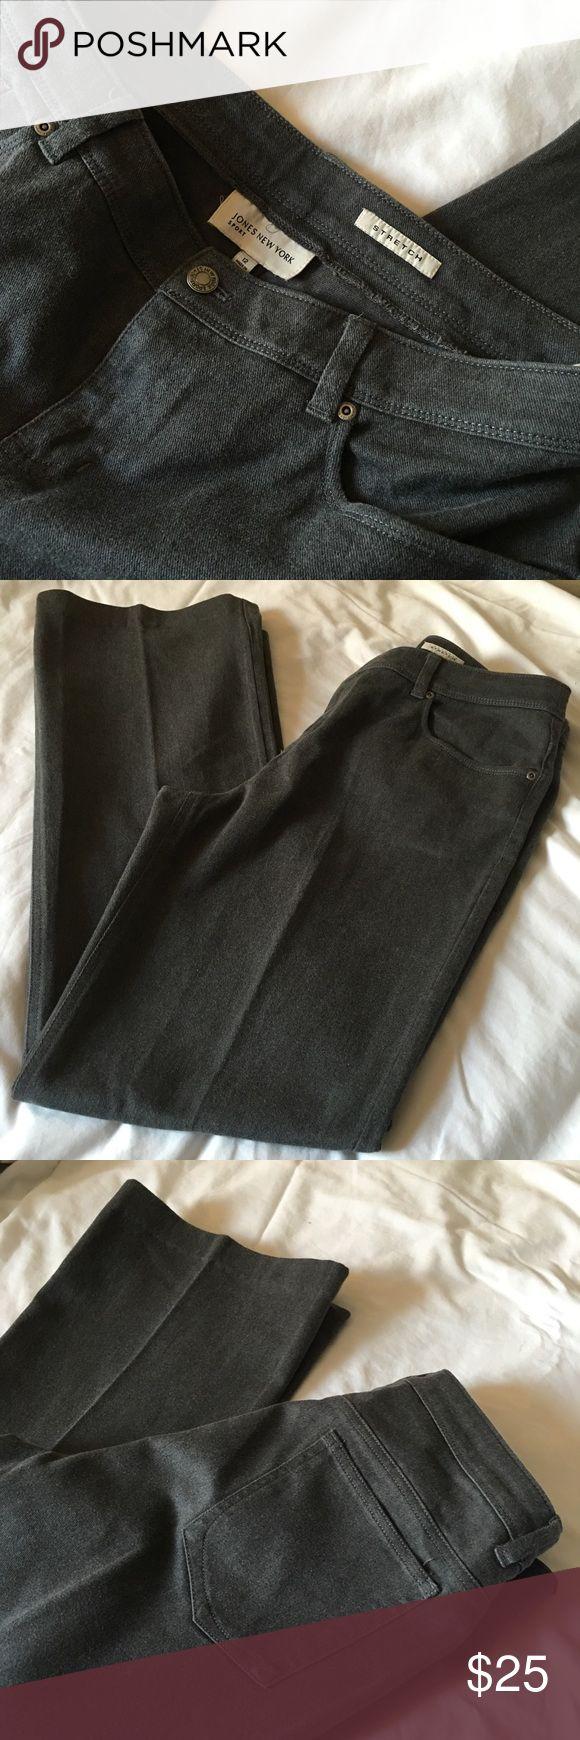 Jones New York Charcoal Stretch Boot Cut Jeans, 12 Jones New York Charcoal Gray / Off Black Stretch Boot Cut Jeans, Size 12, NWOT never worn. Jones New York Jeans Boot Cut